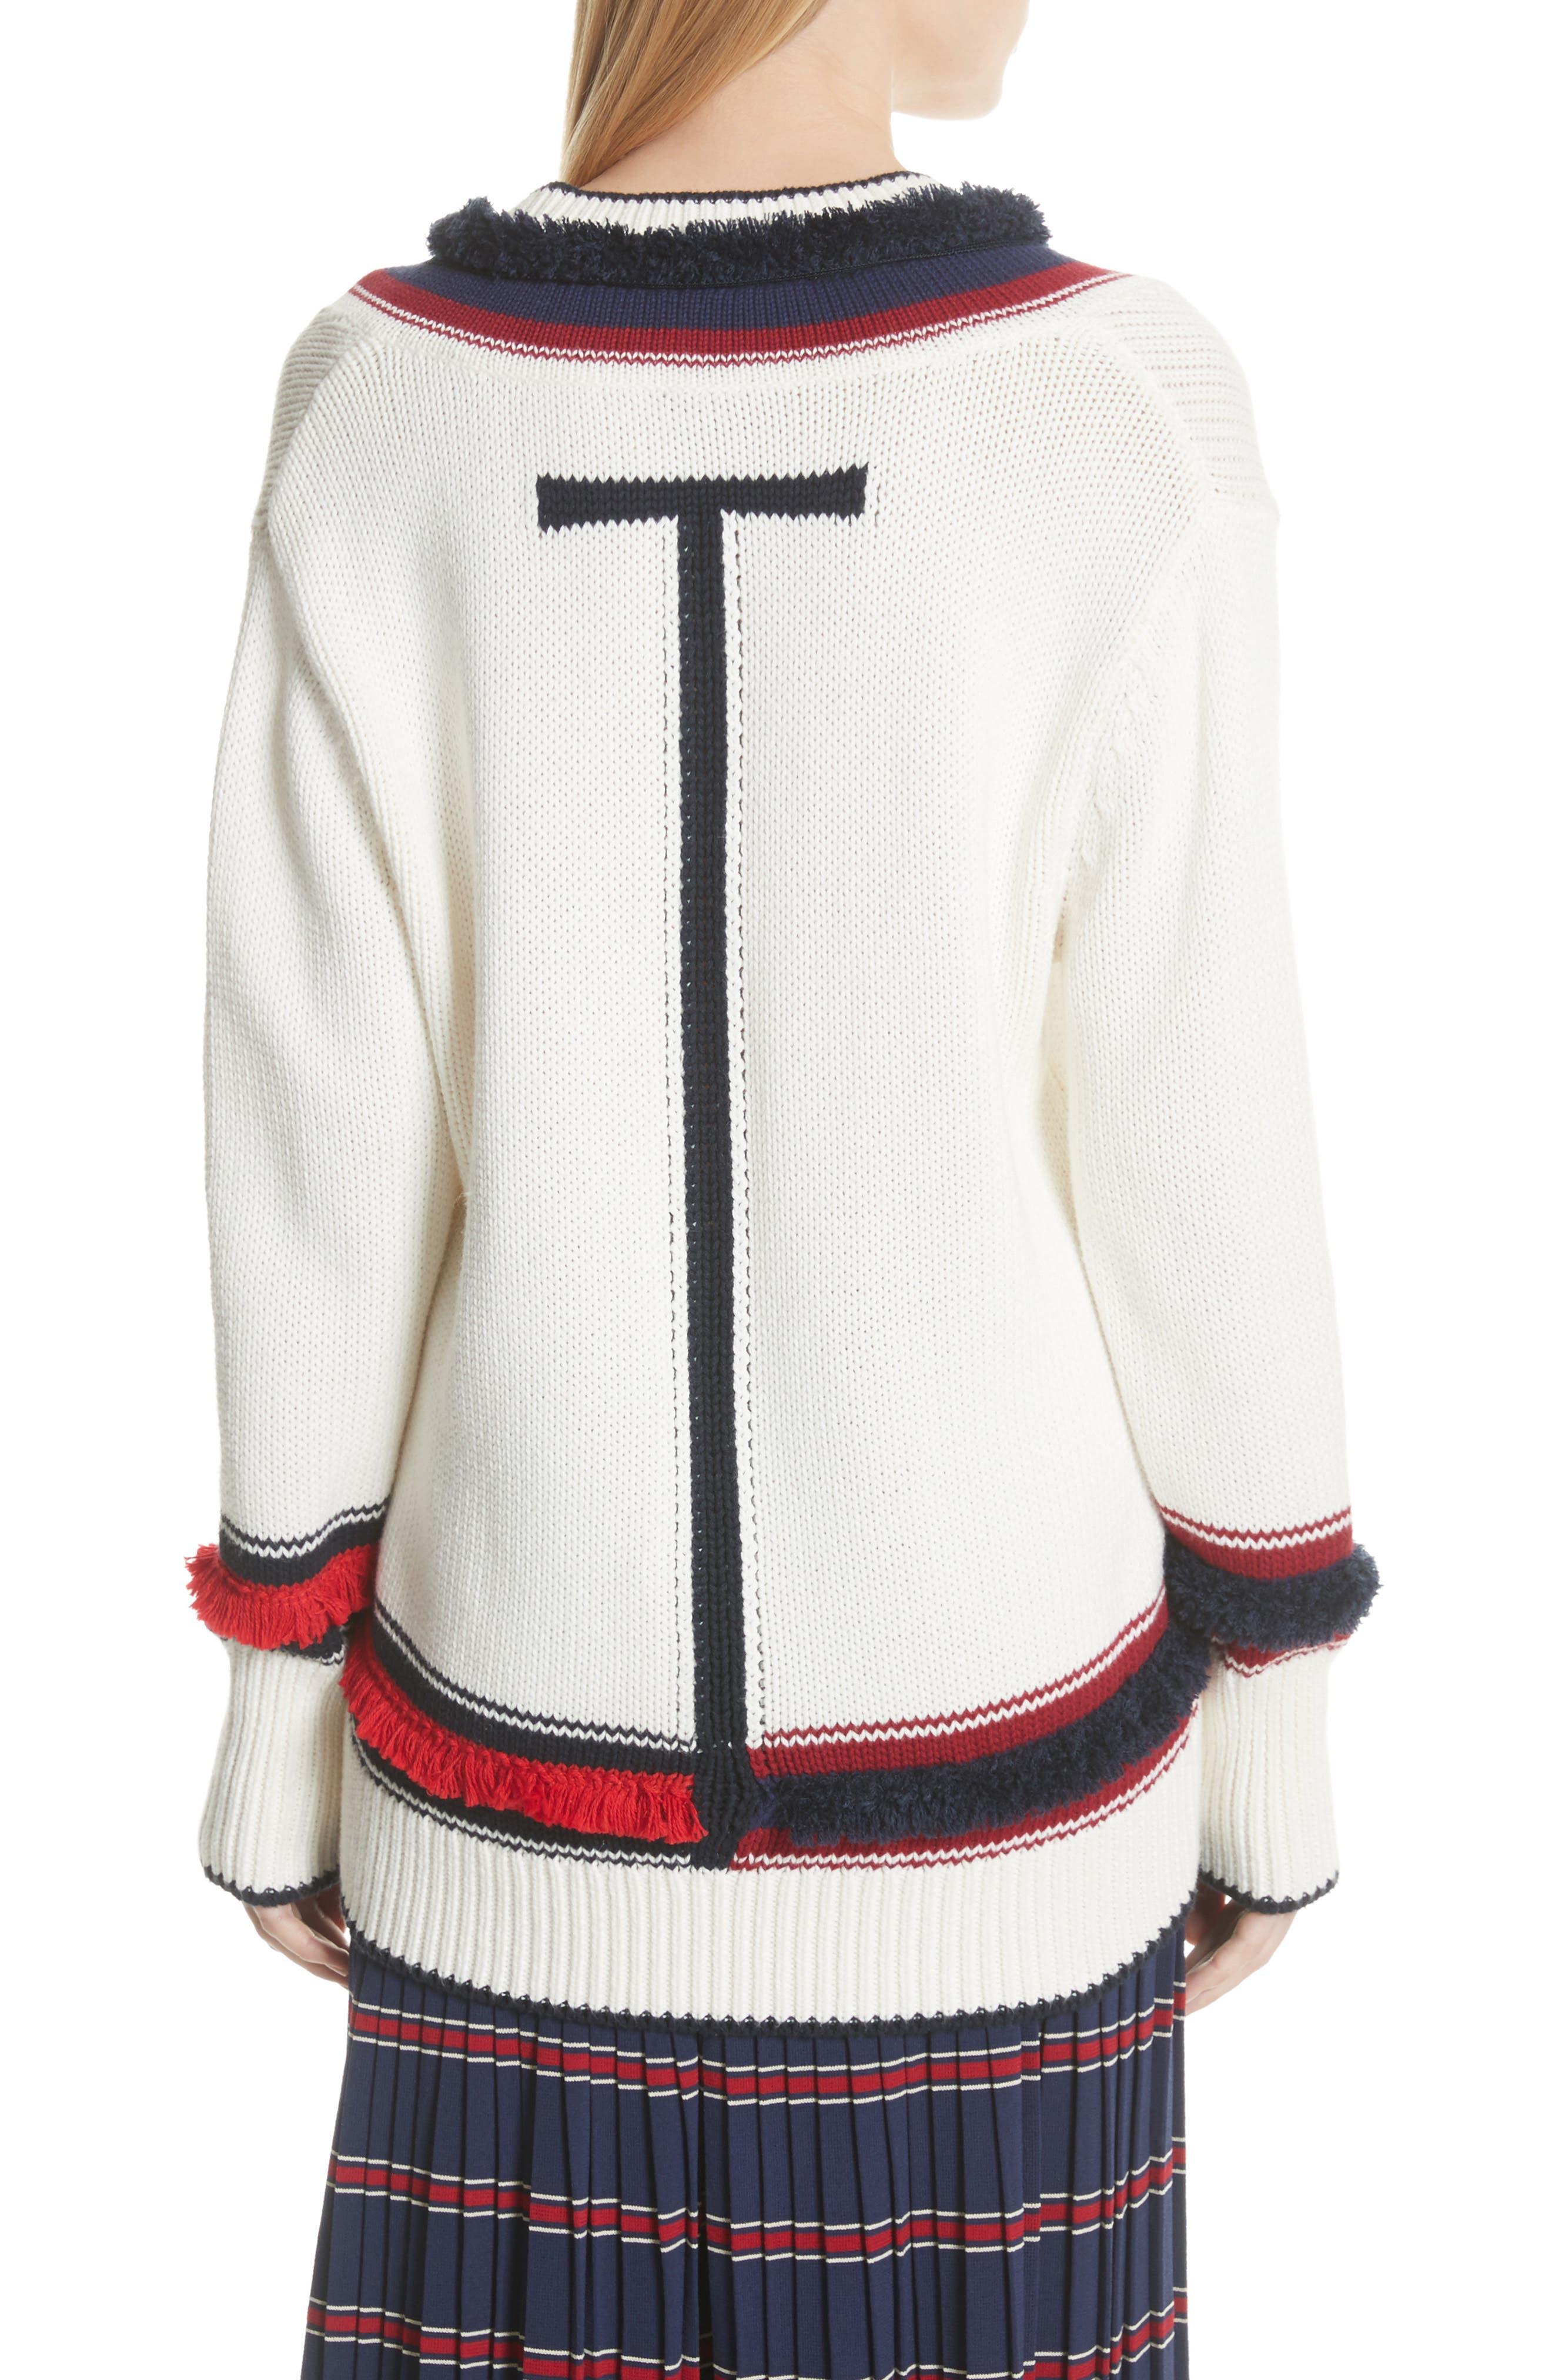 V-Neck Cotton & Cashmere Sweater,                             Alternate thumbnail 2, color,                             900